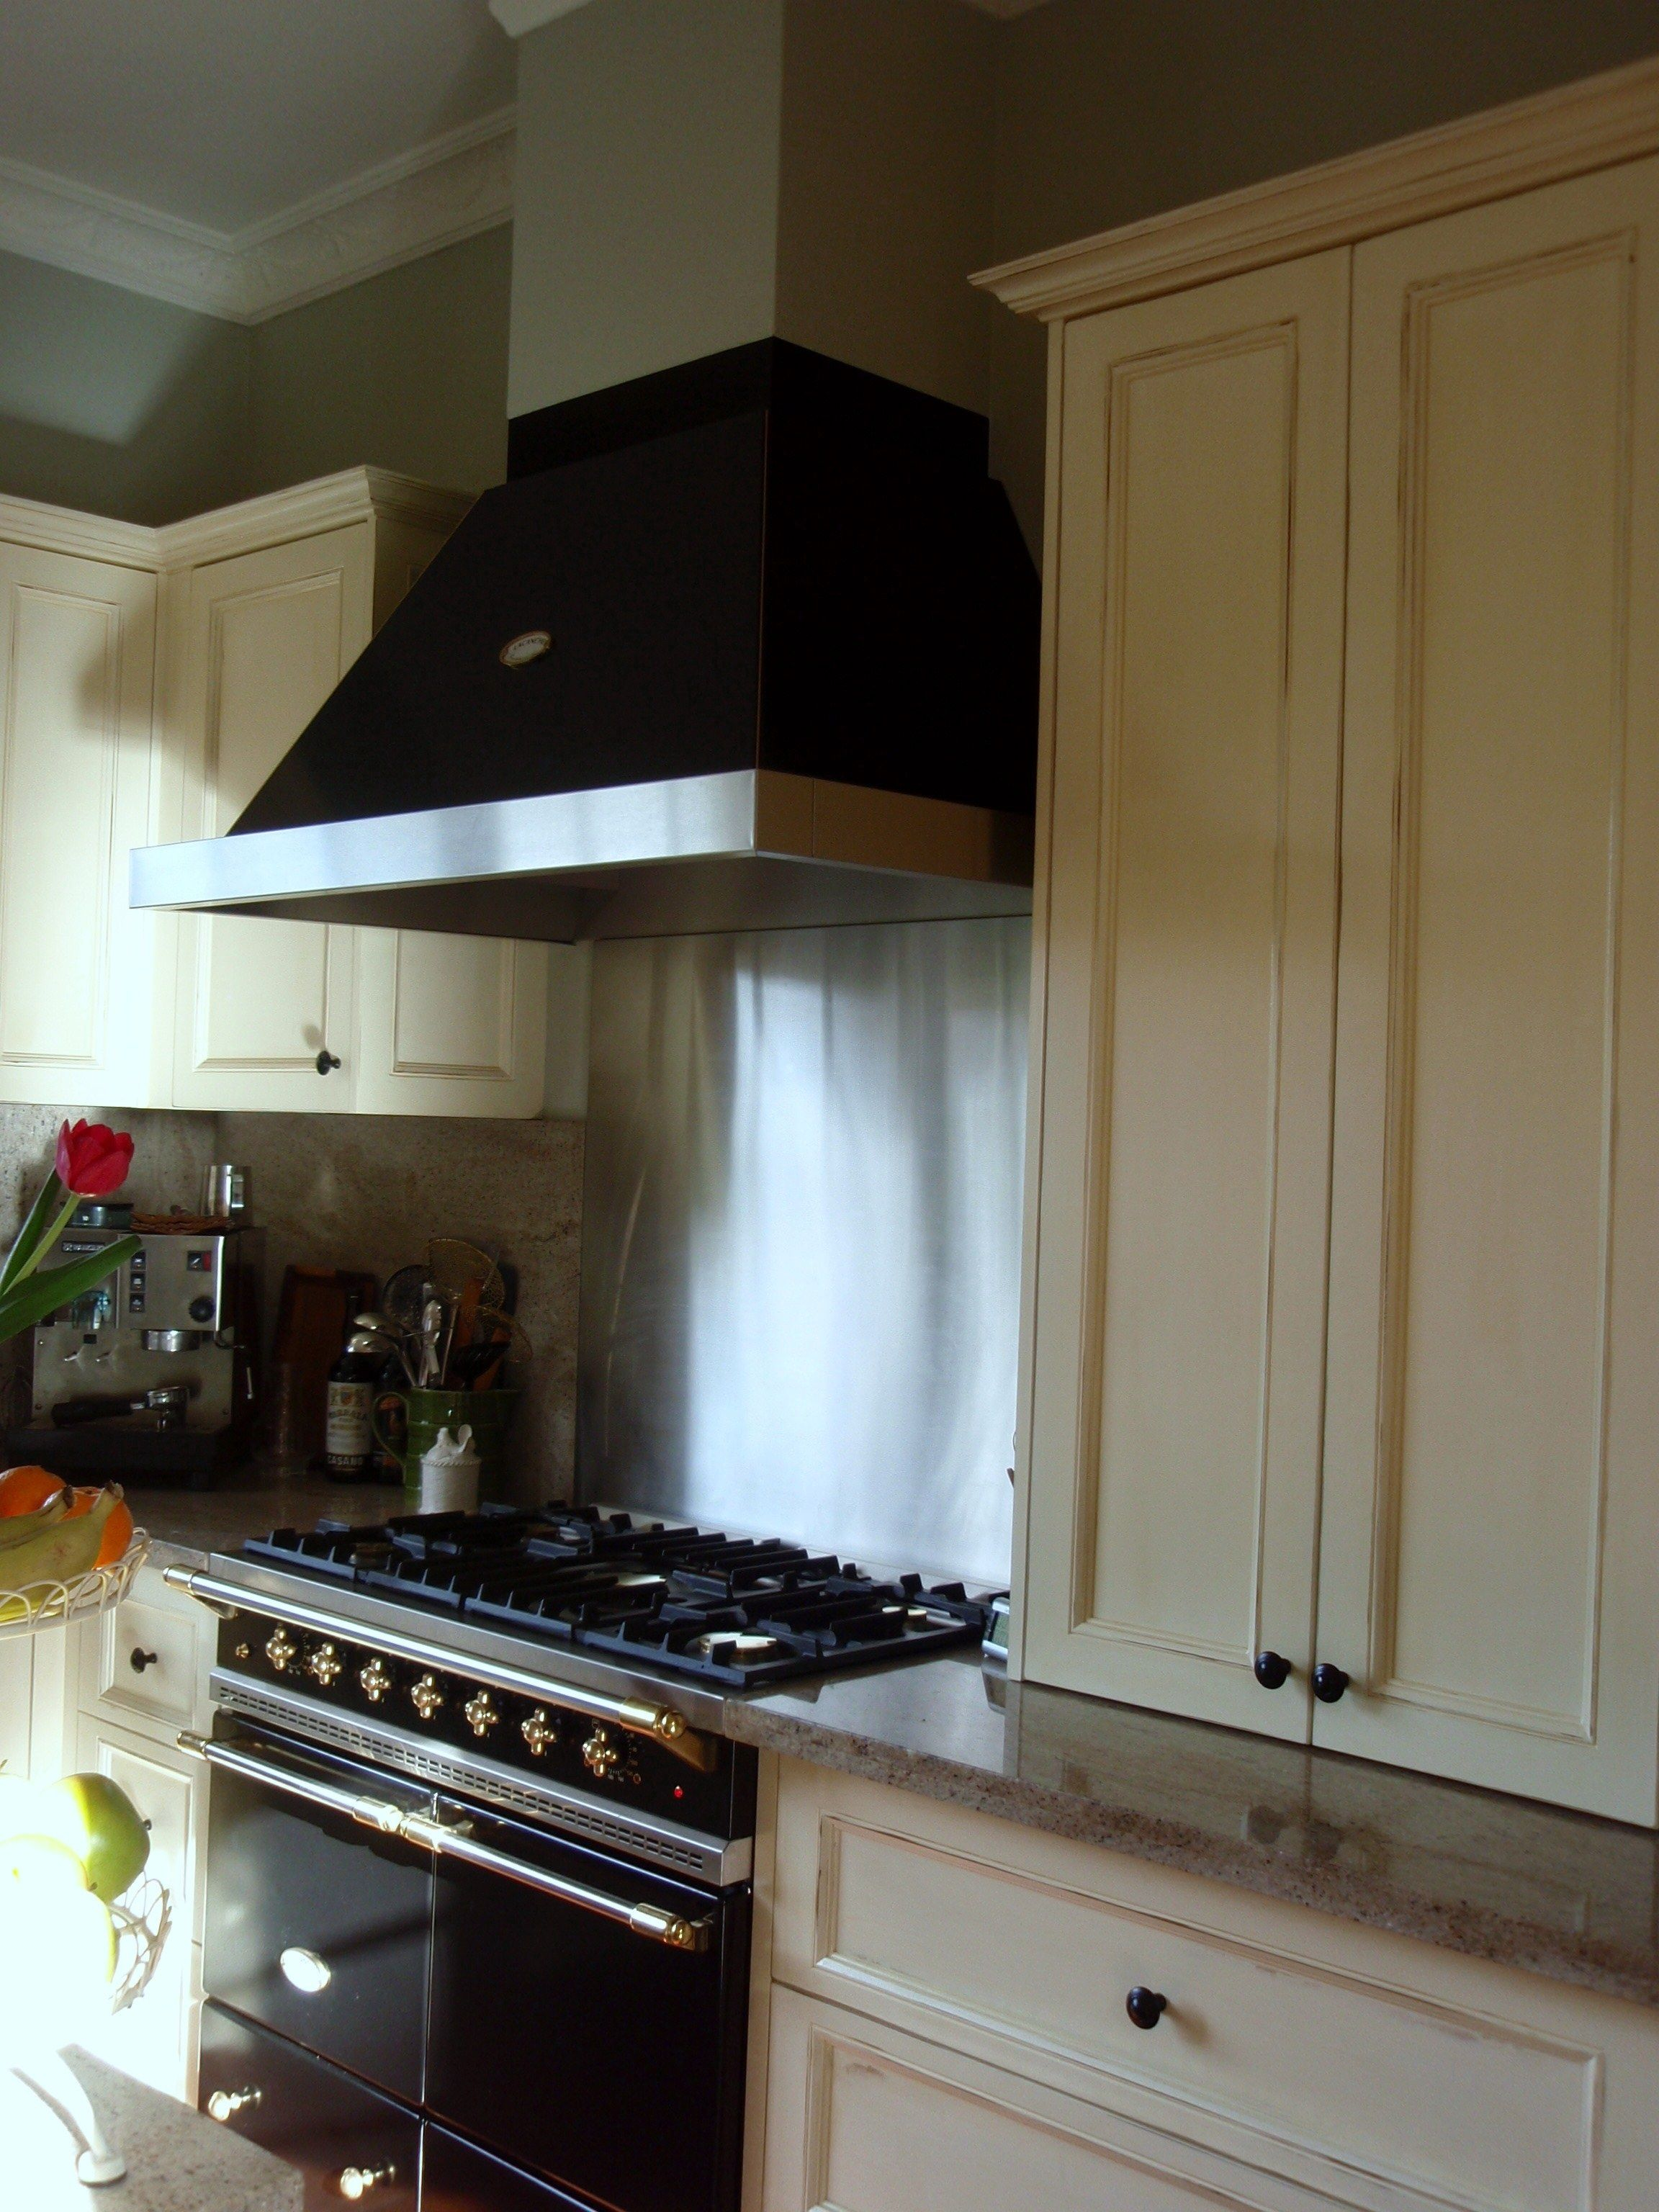 Lacanche Rangehood And Bulkhead Kitchen Design Bronze Kitchen Hardware New Kitchen